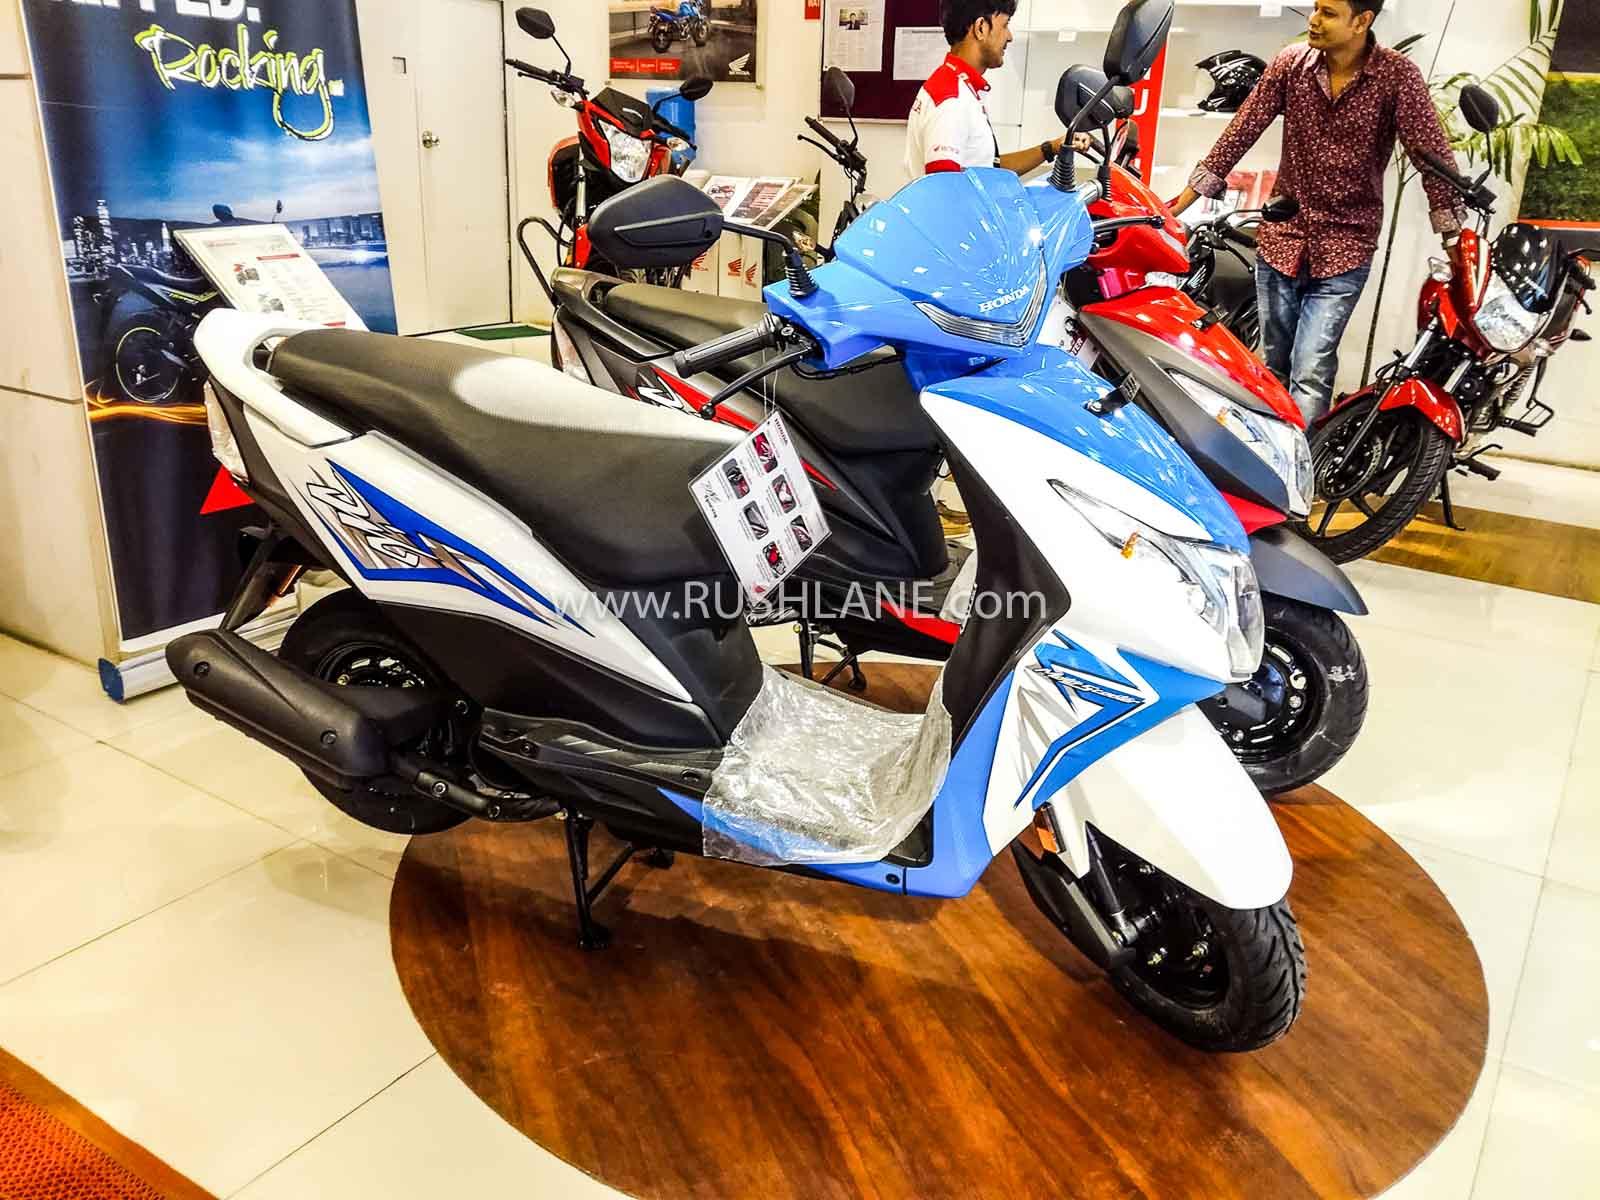 Honda Dio exports